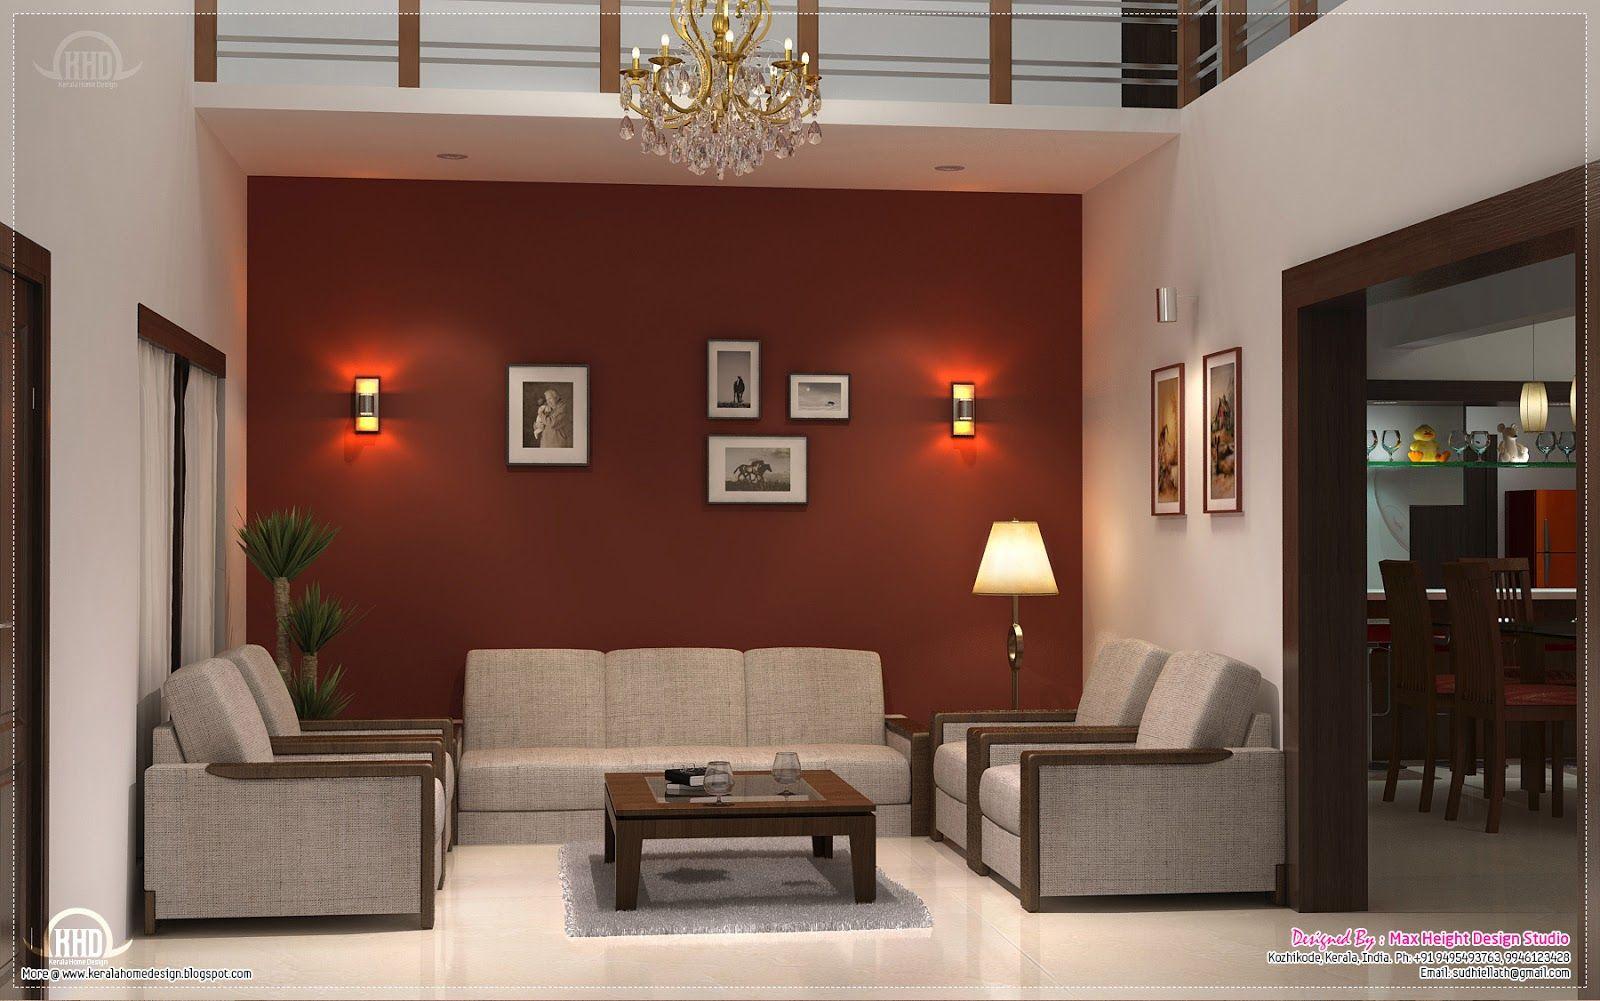 Living Room 2 Interior Decor Pinterest Home Interior Design